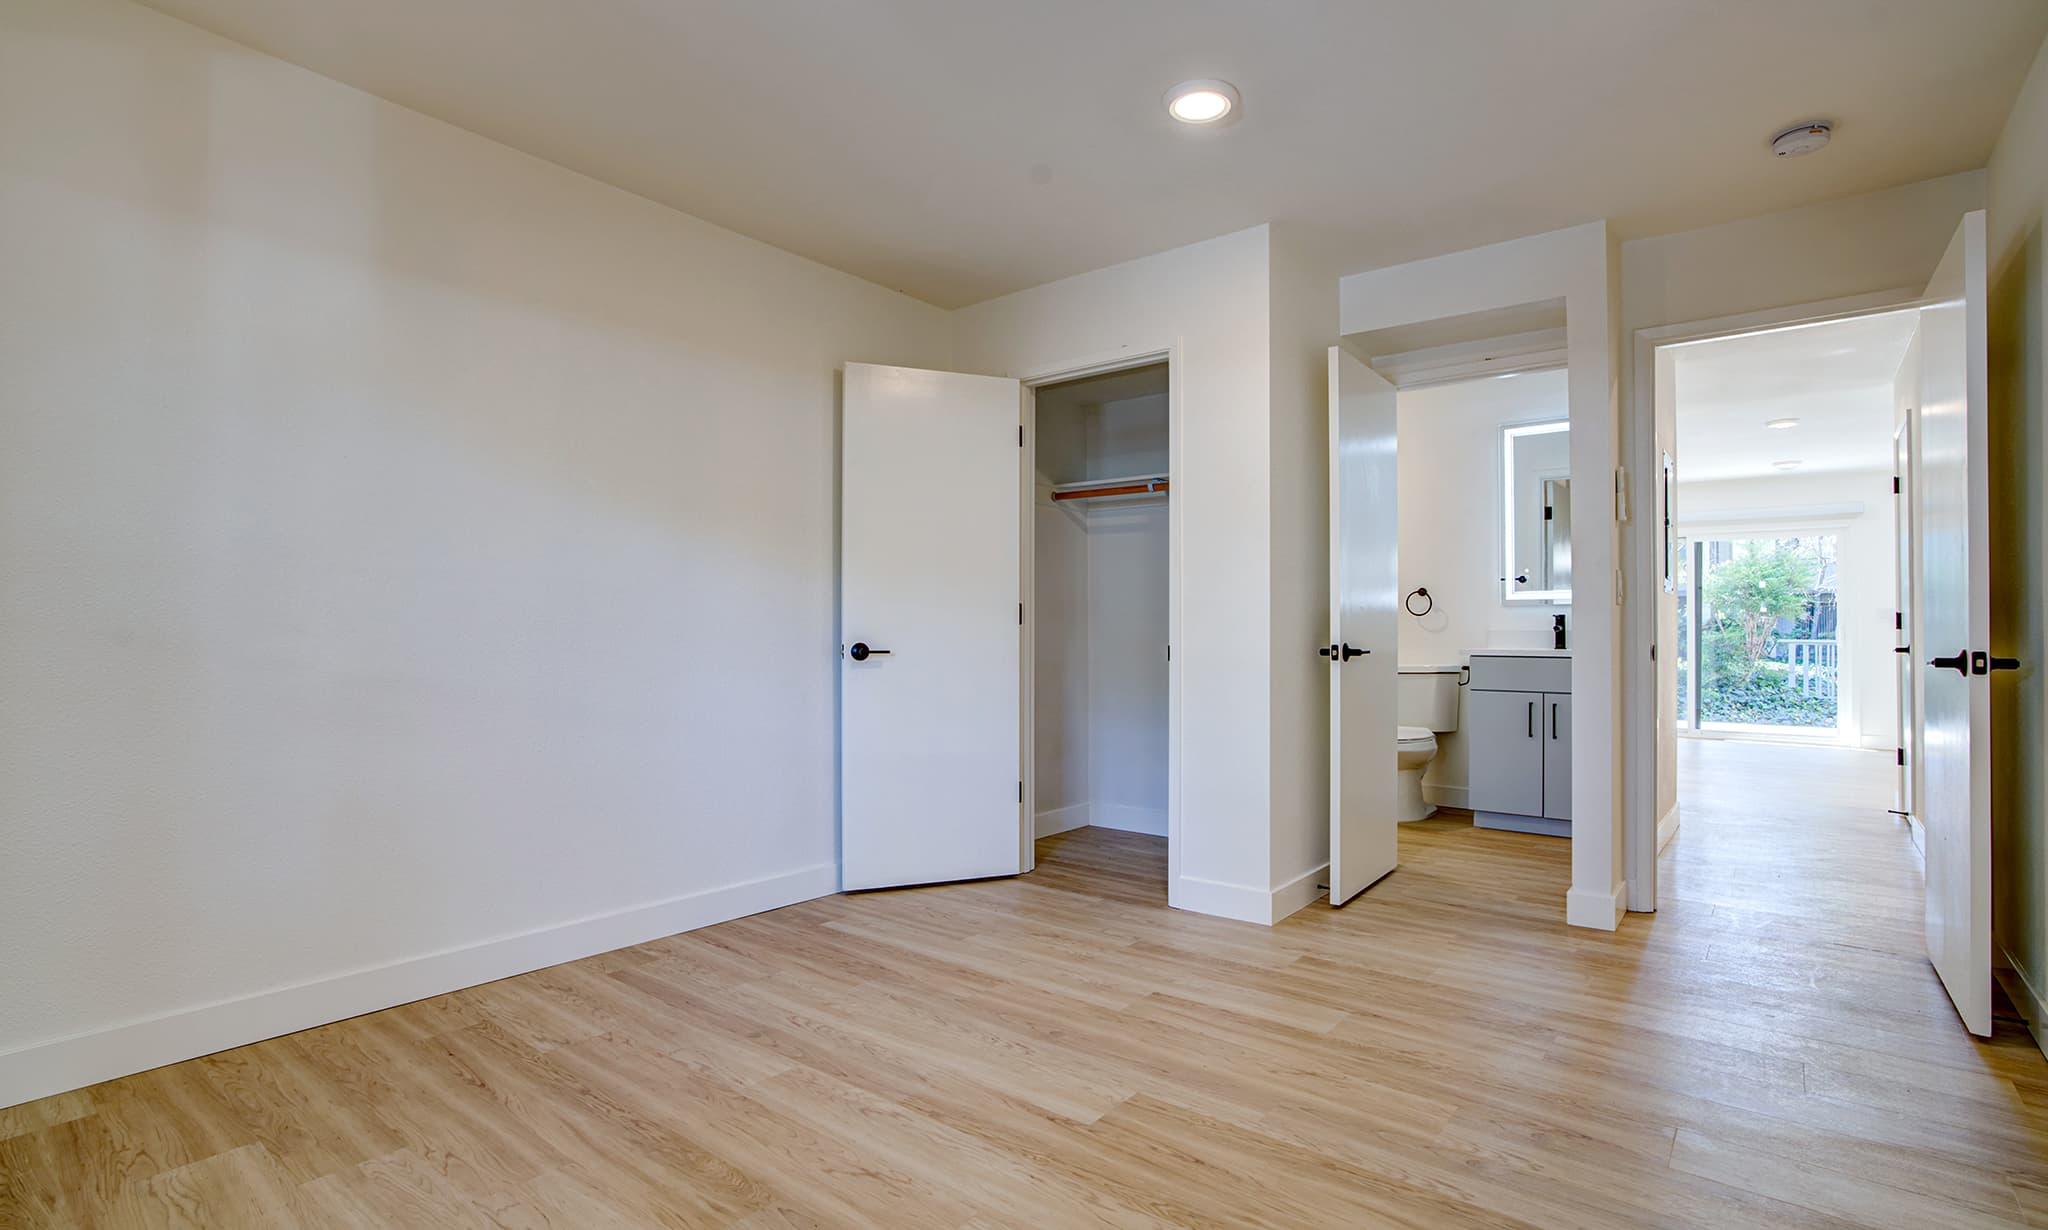 Boardwalk Apartments apartments in Santa Clara CA to rent photo 9